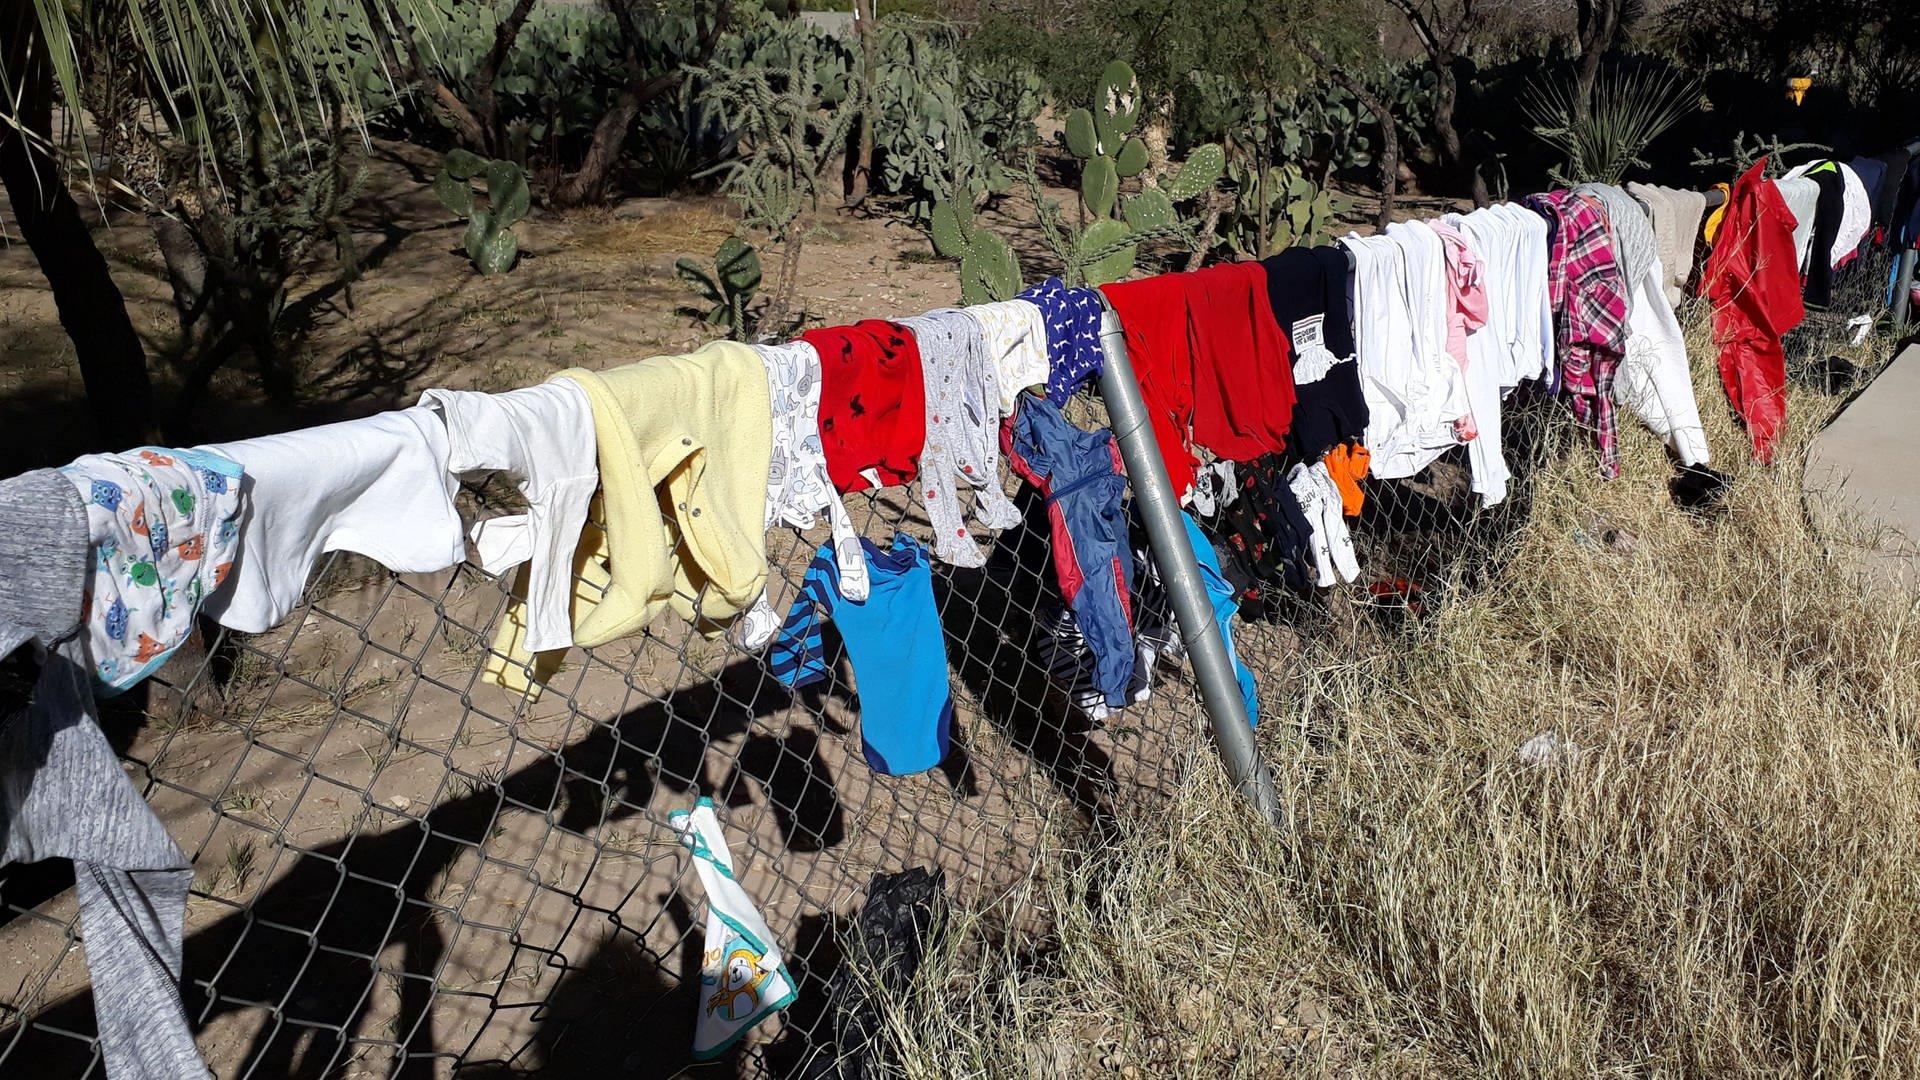 Waesche-der-Migrantinnen-in-der-Notunterkunft-Ciudad-Juarez,1566289631164,swr2-leben-2019-09-16-102 V-16x9@2dXL -77ed5d09bafd4e3cf6a5a0264e5e16ea35f14925